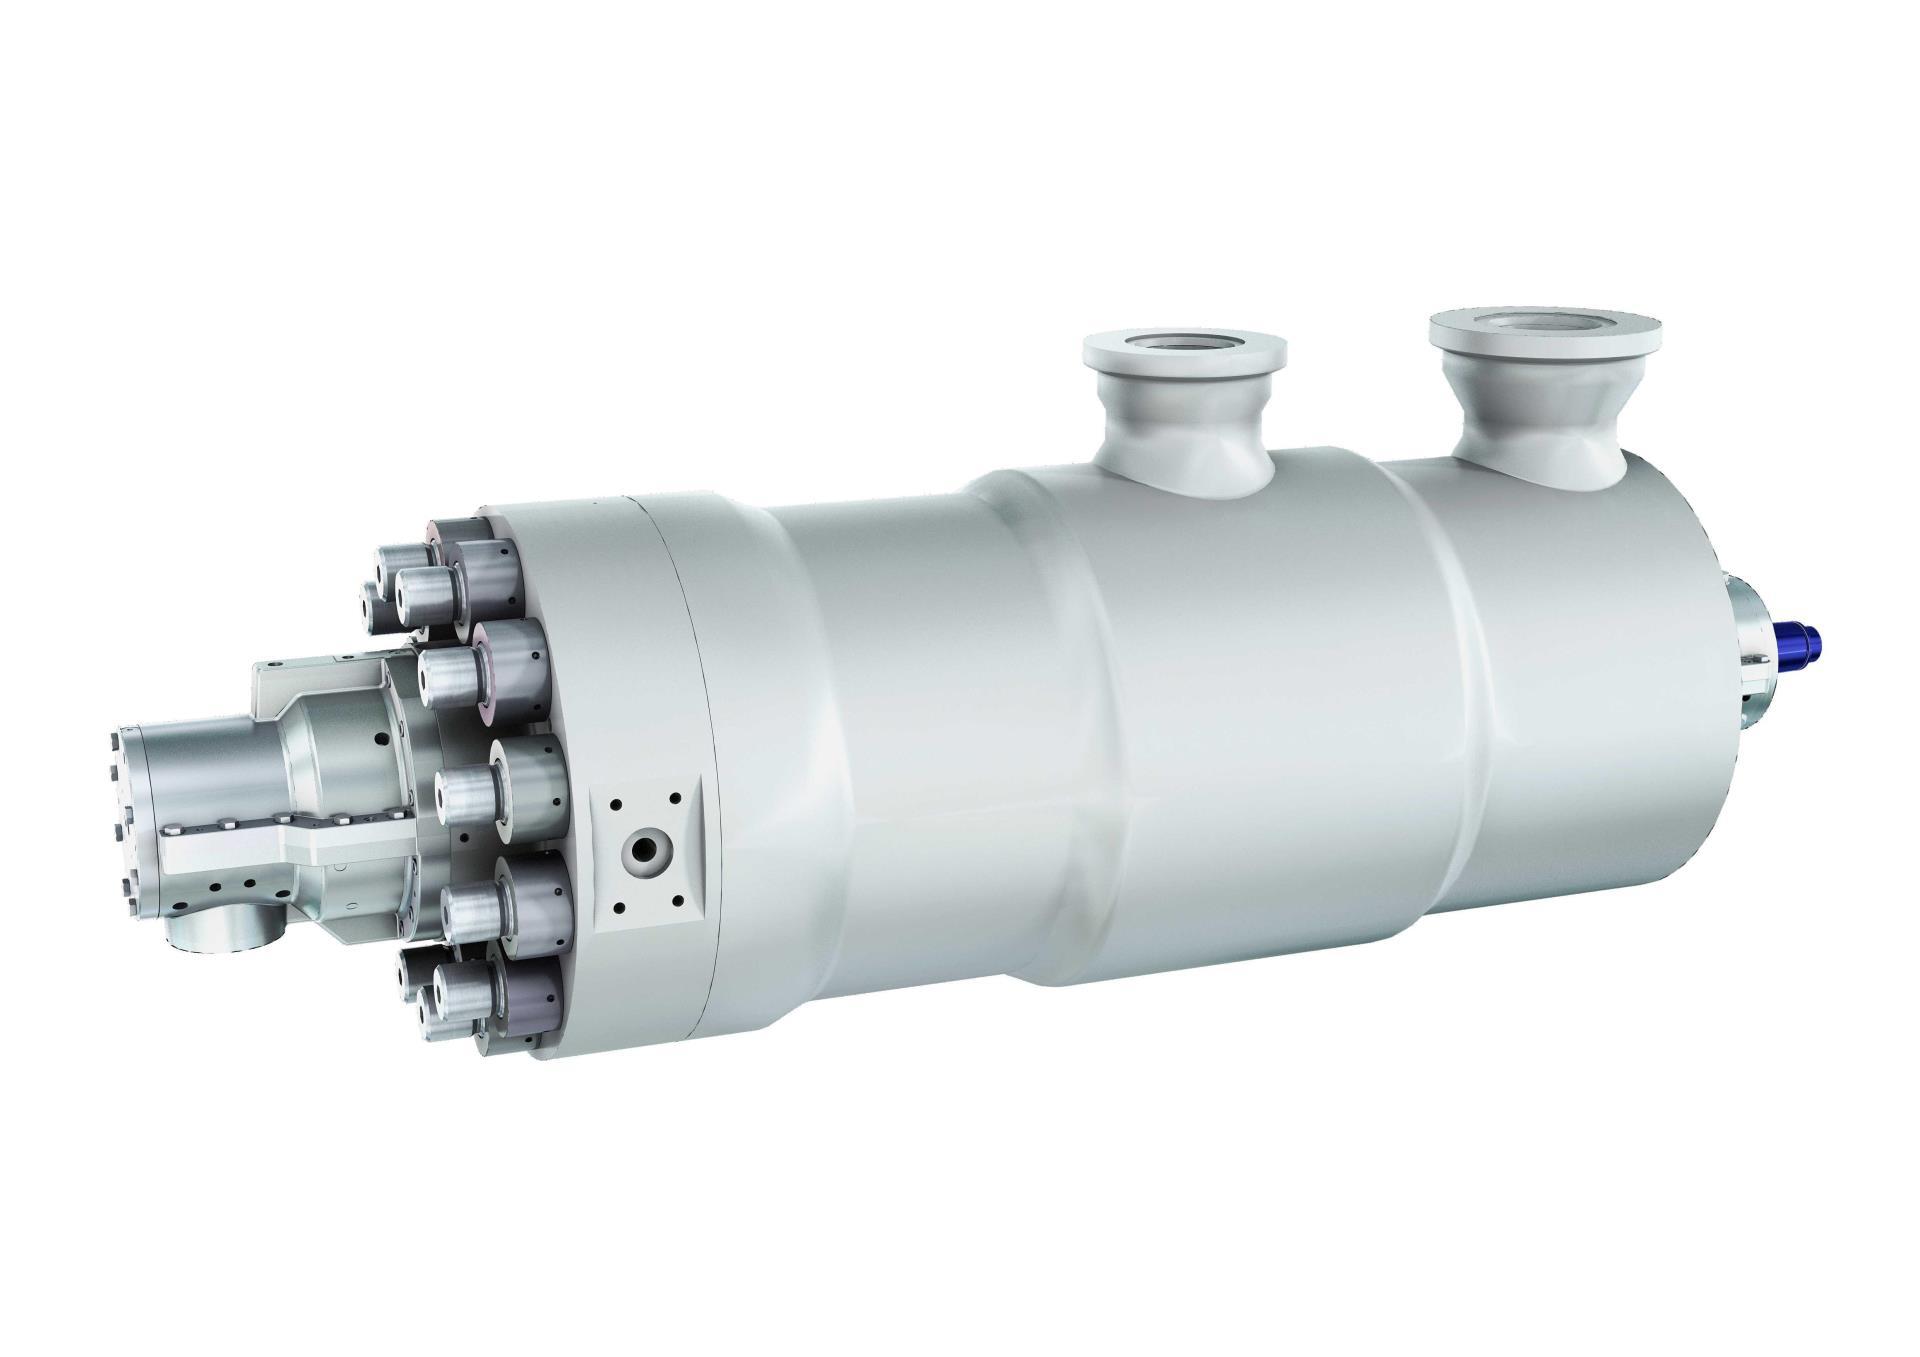 ISO 13709 (API 610) BB5 - HPcp Multisatge Barrel Casing Pumps